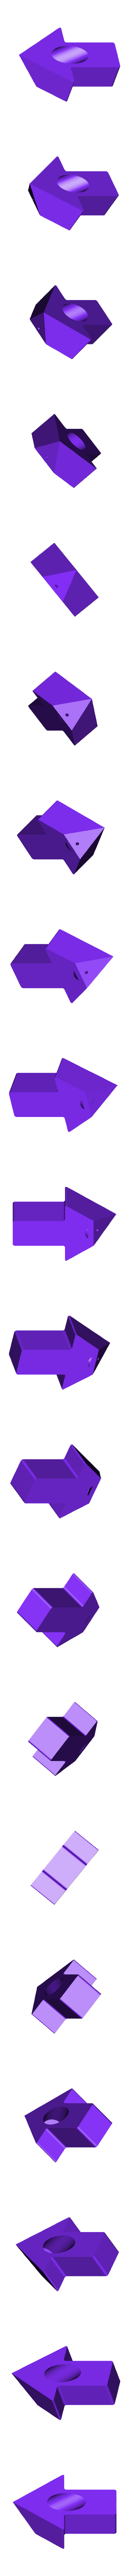 arrow_pin.stl Download free STL file Arrow-shaped Push pin • Model to 3D print, WallTosh